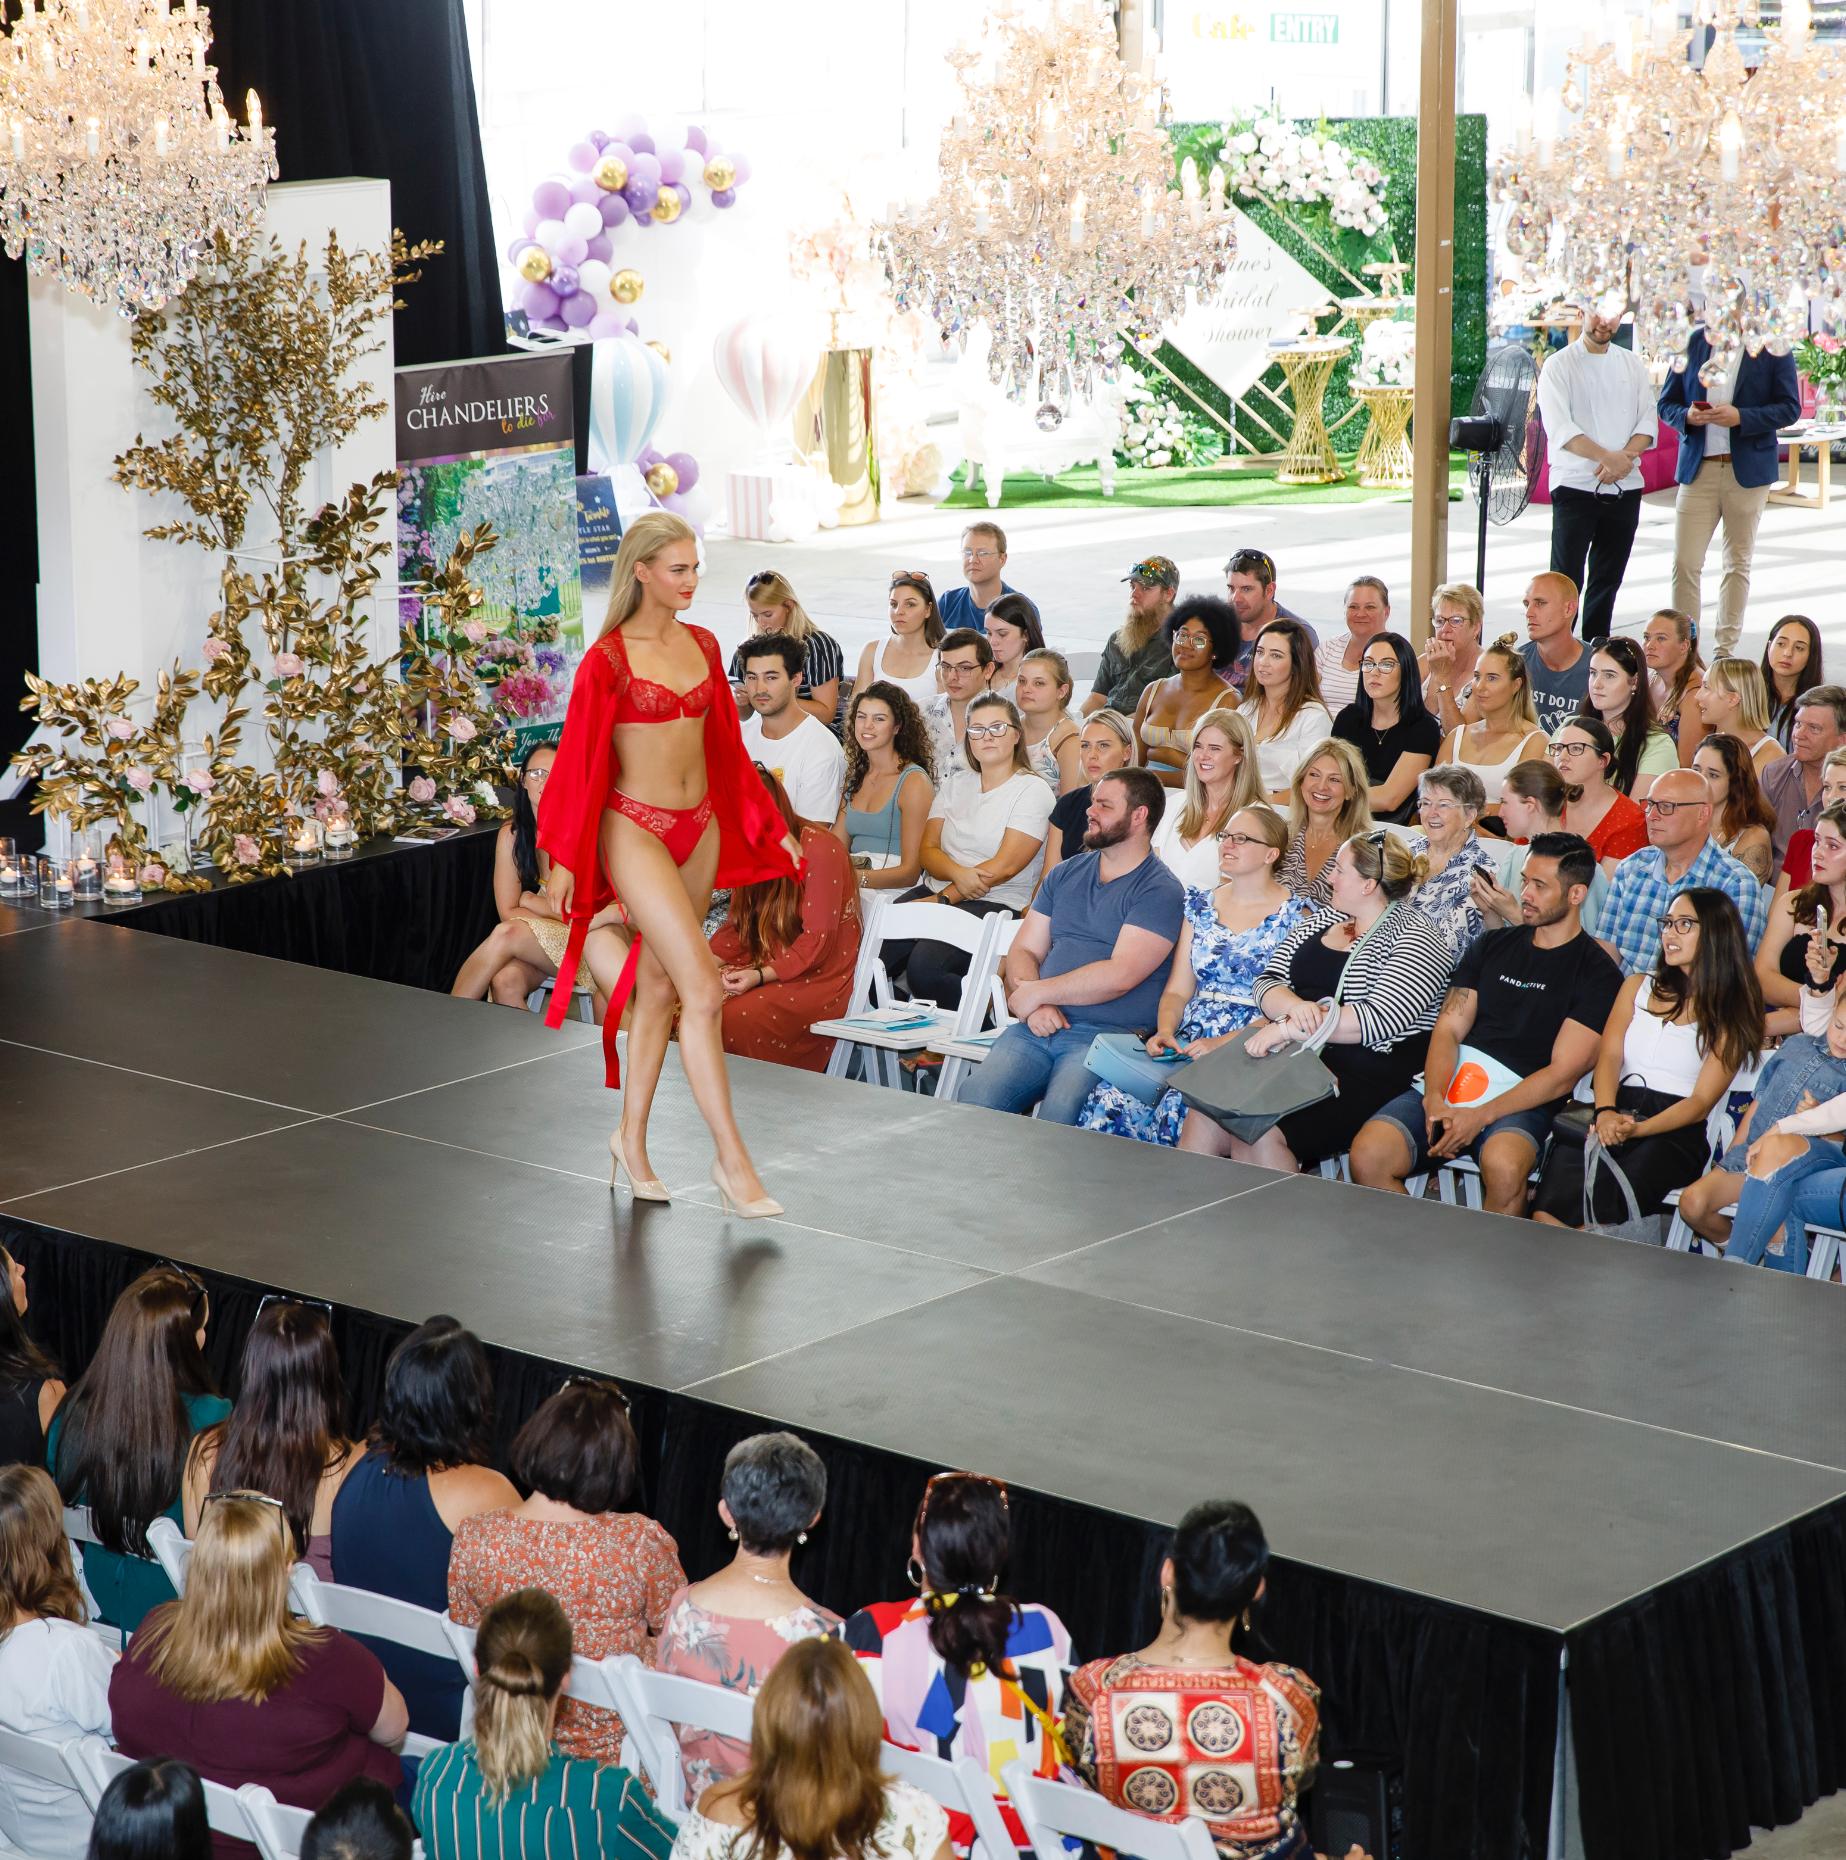 women in lingerie modelling on stage